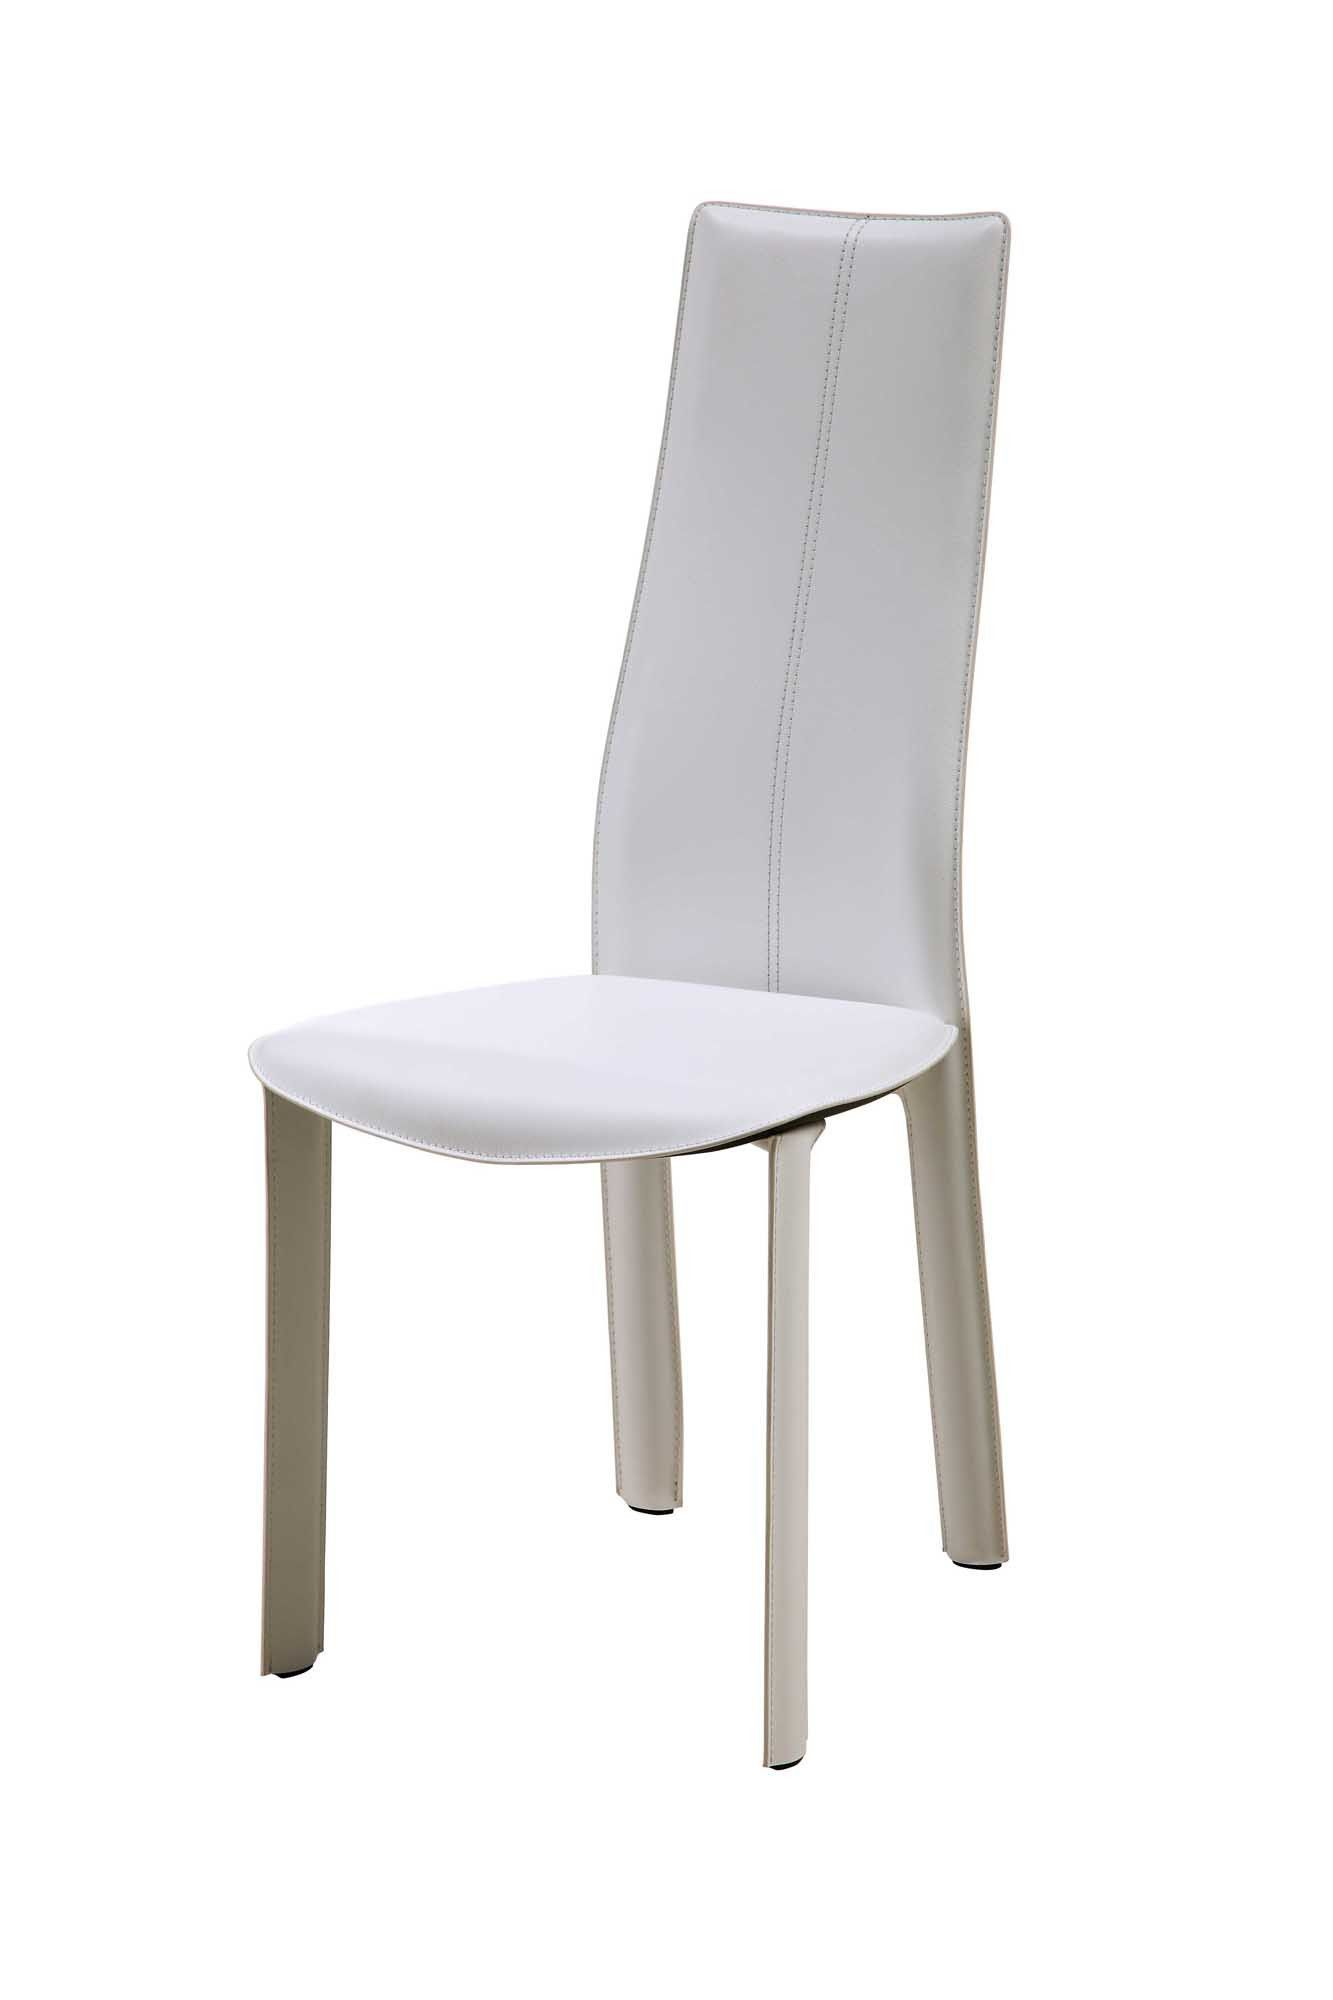 Whiteline Allison Dining Chair - Set of 4